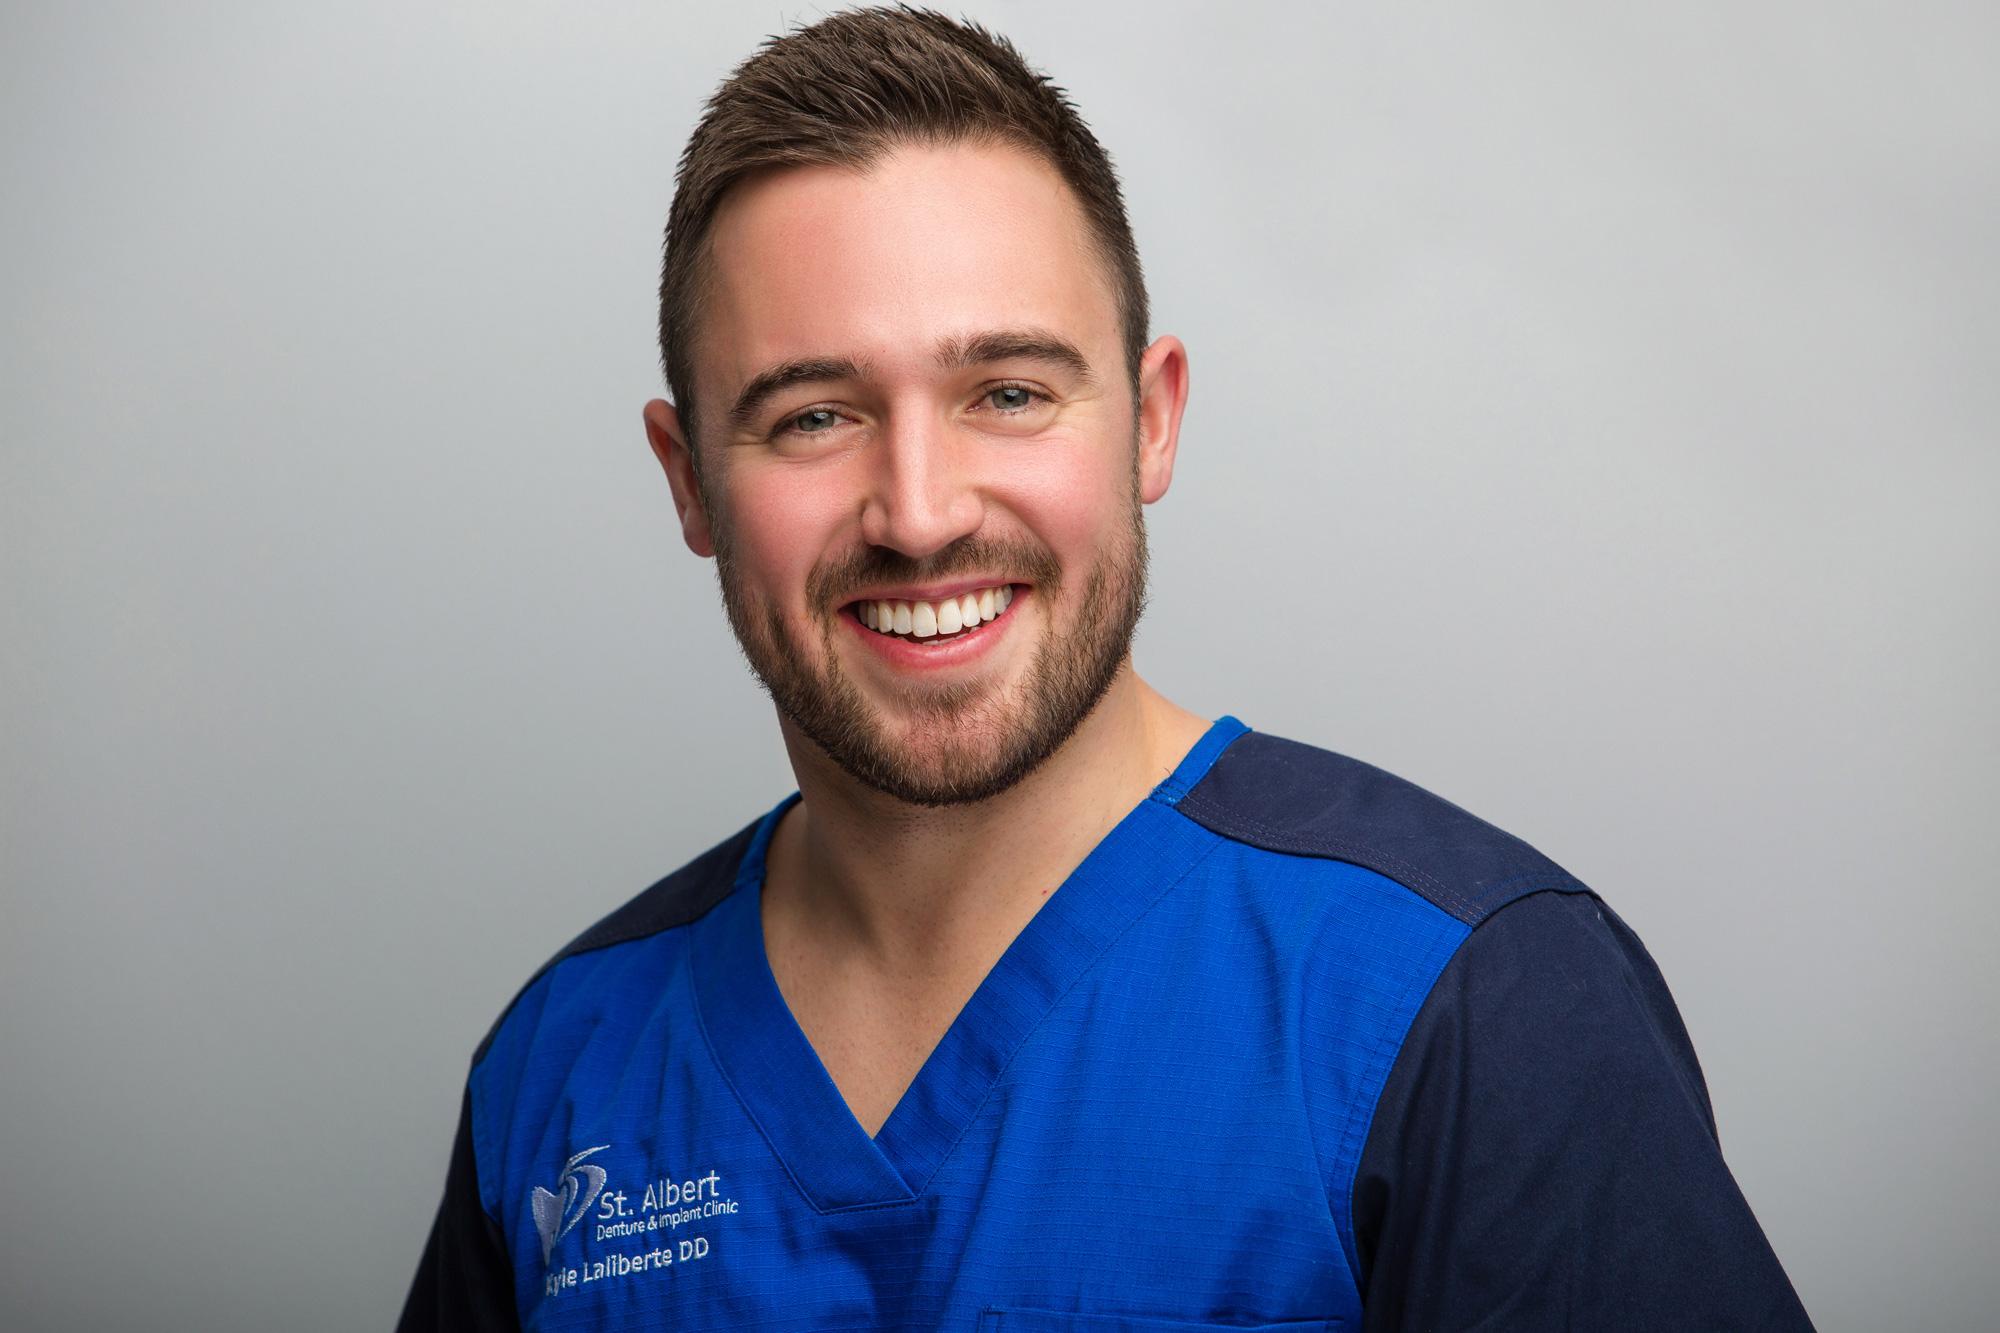 Kyle Laliberte Denturist Smiling